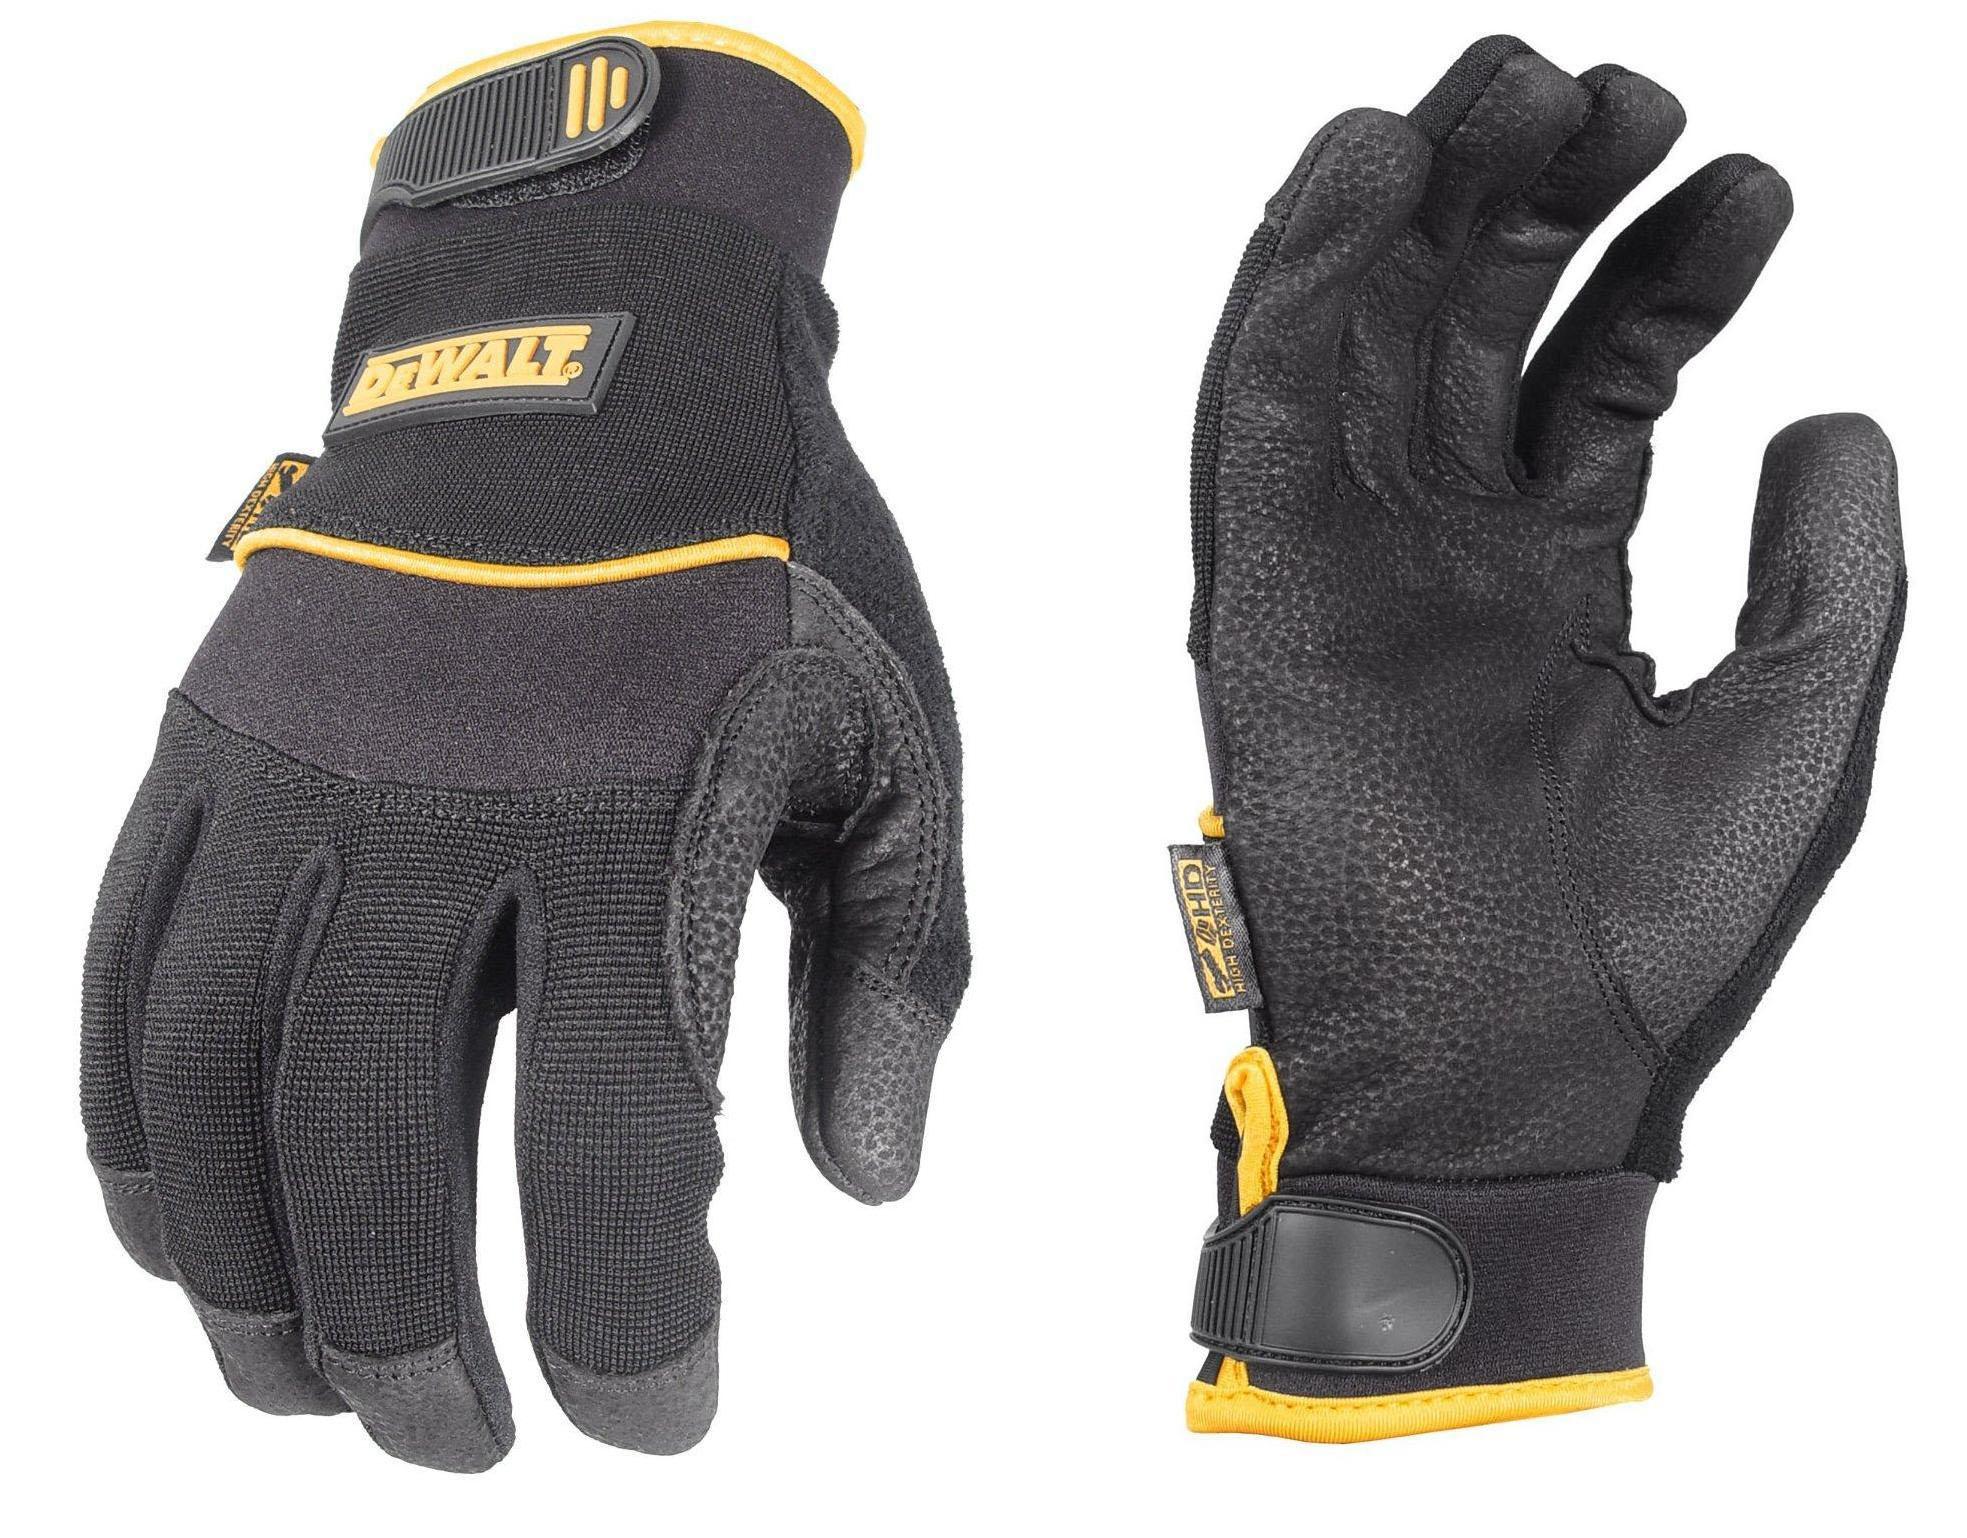 DeWALT DPG220L - Premium Leather Performance Palm Glove